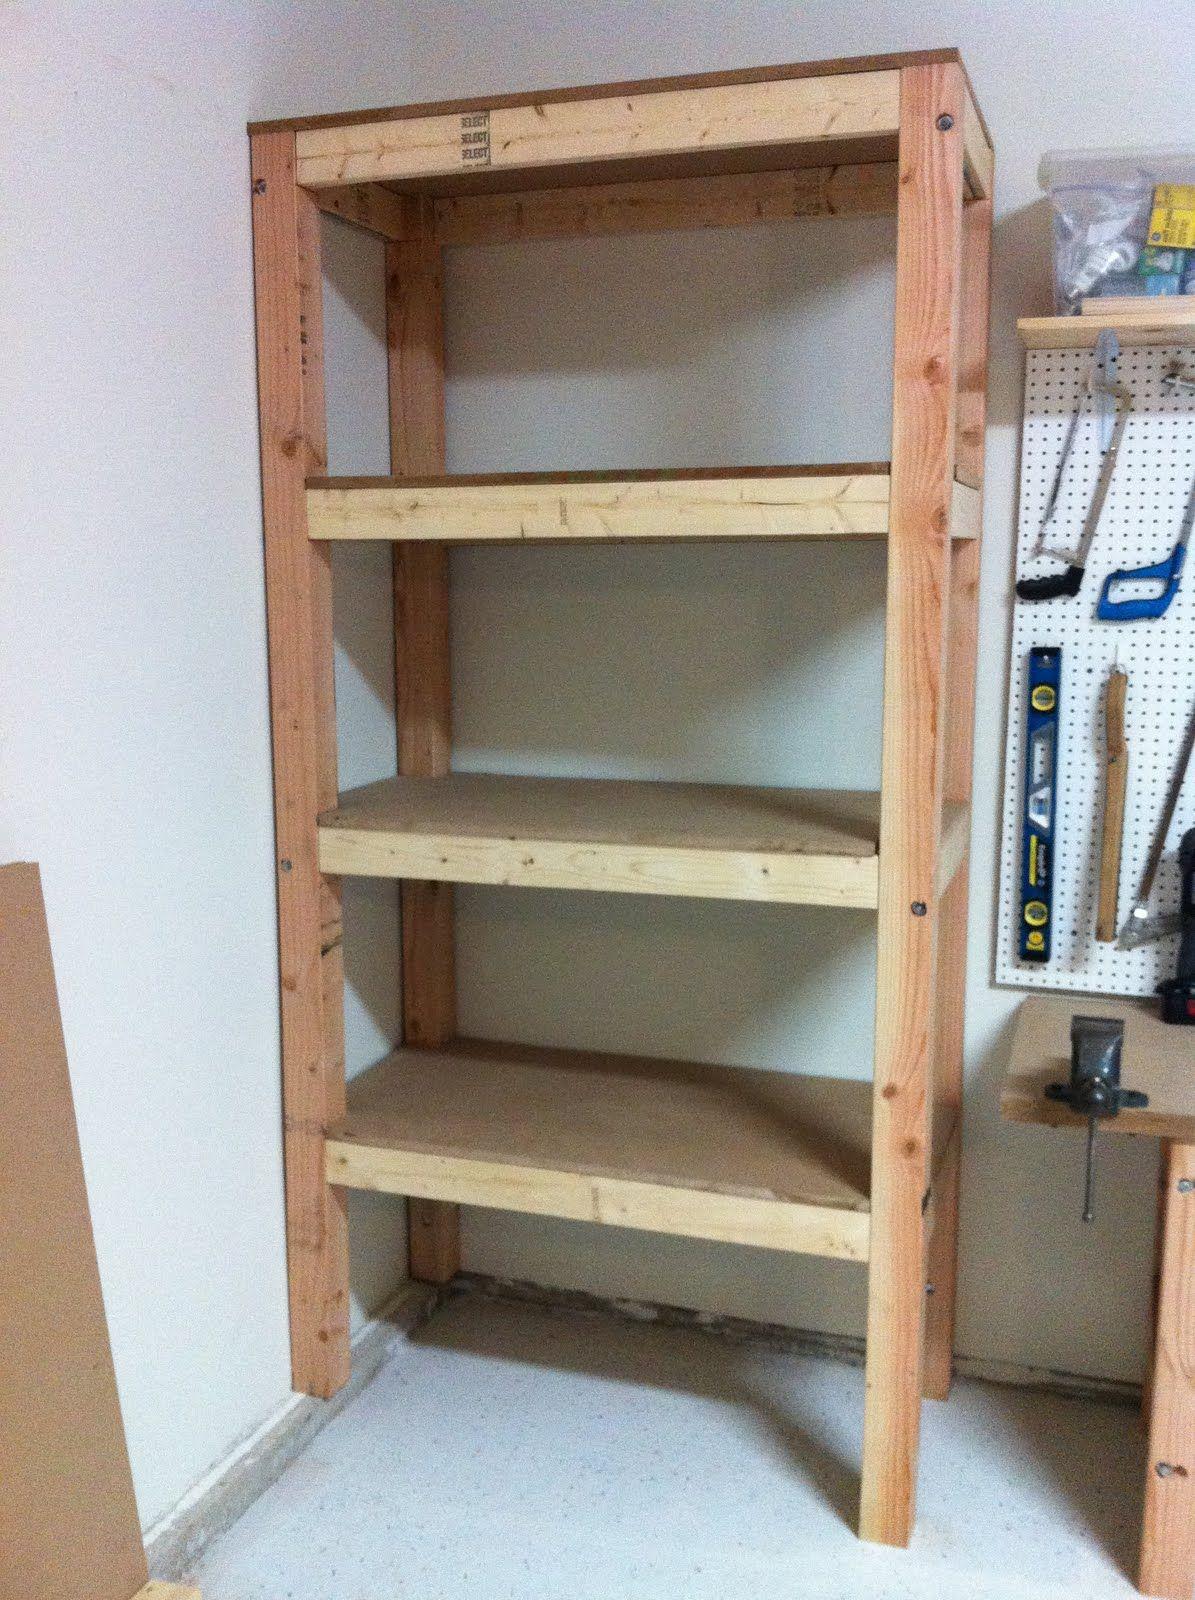 Diy garage shelving ideas shelves 34 mdf board